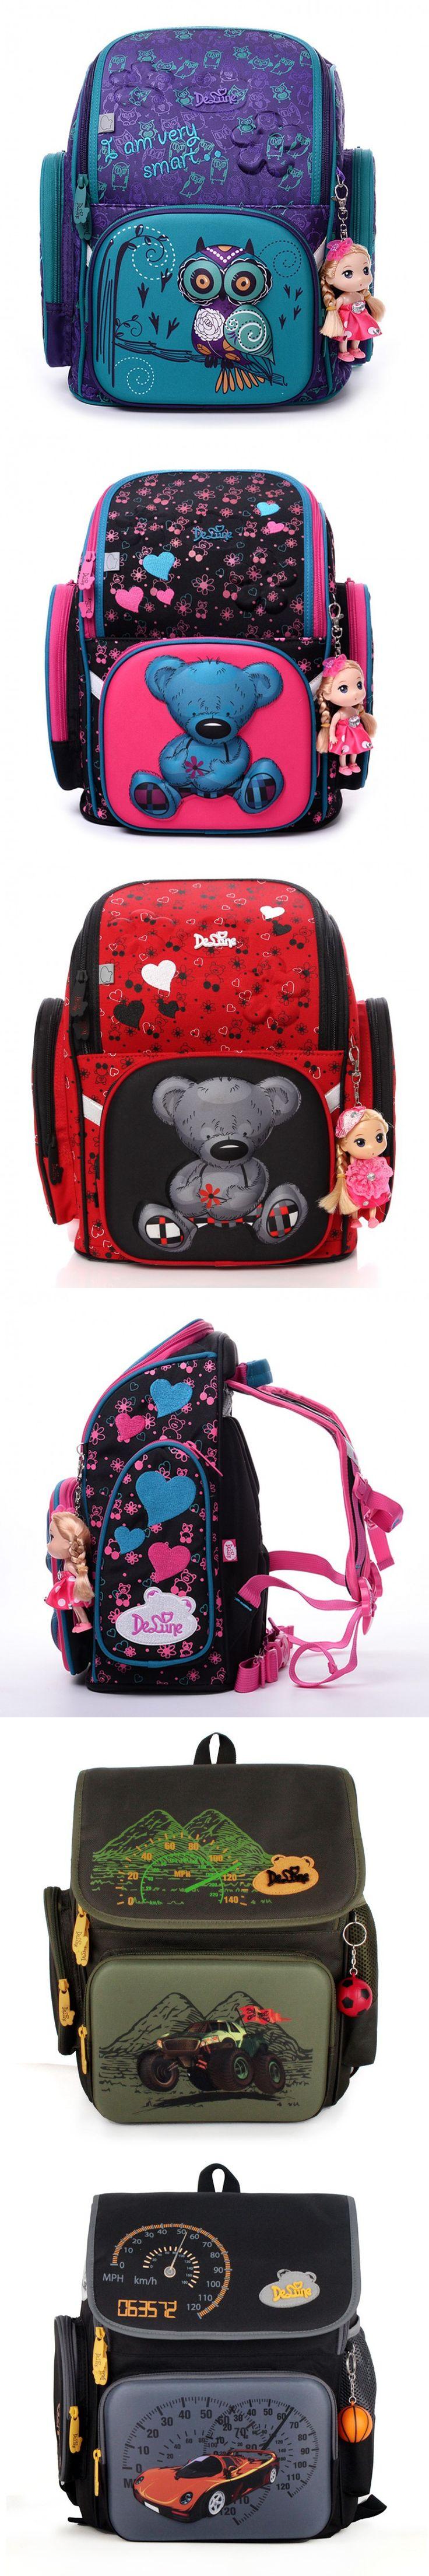 New 2016 Fashion Brand Cartoon Owl Cute Bear Girl Boys School Bags Waterproof Foldable Orthopedic School Backpacks Kids Bolsas